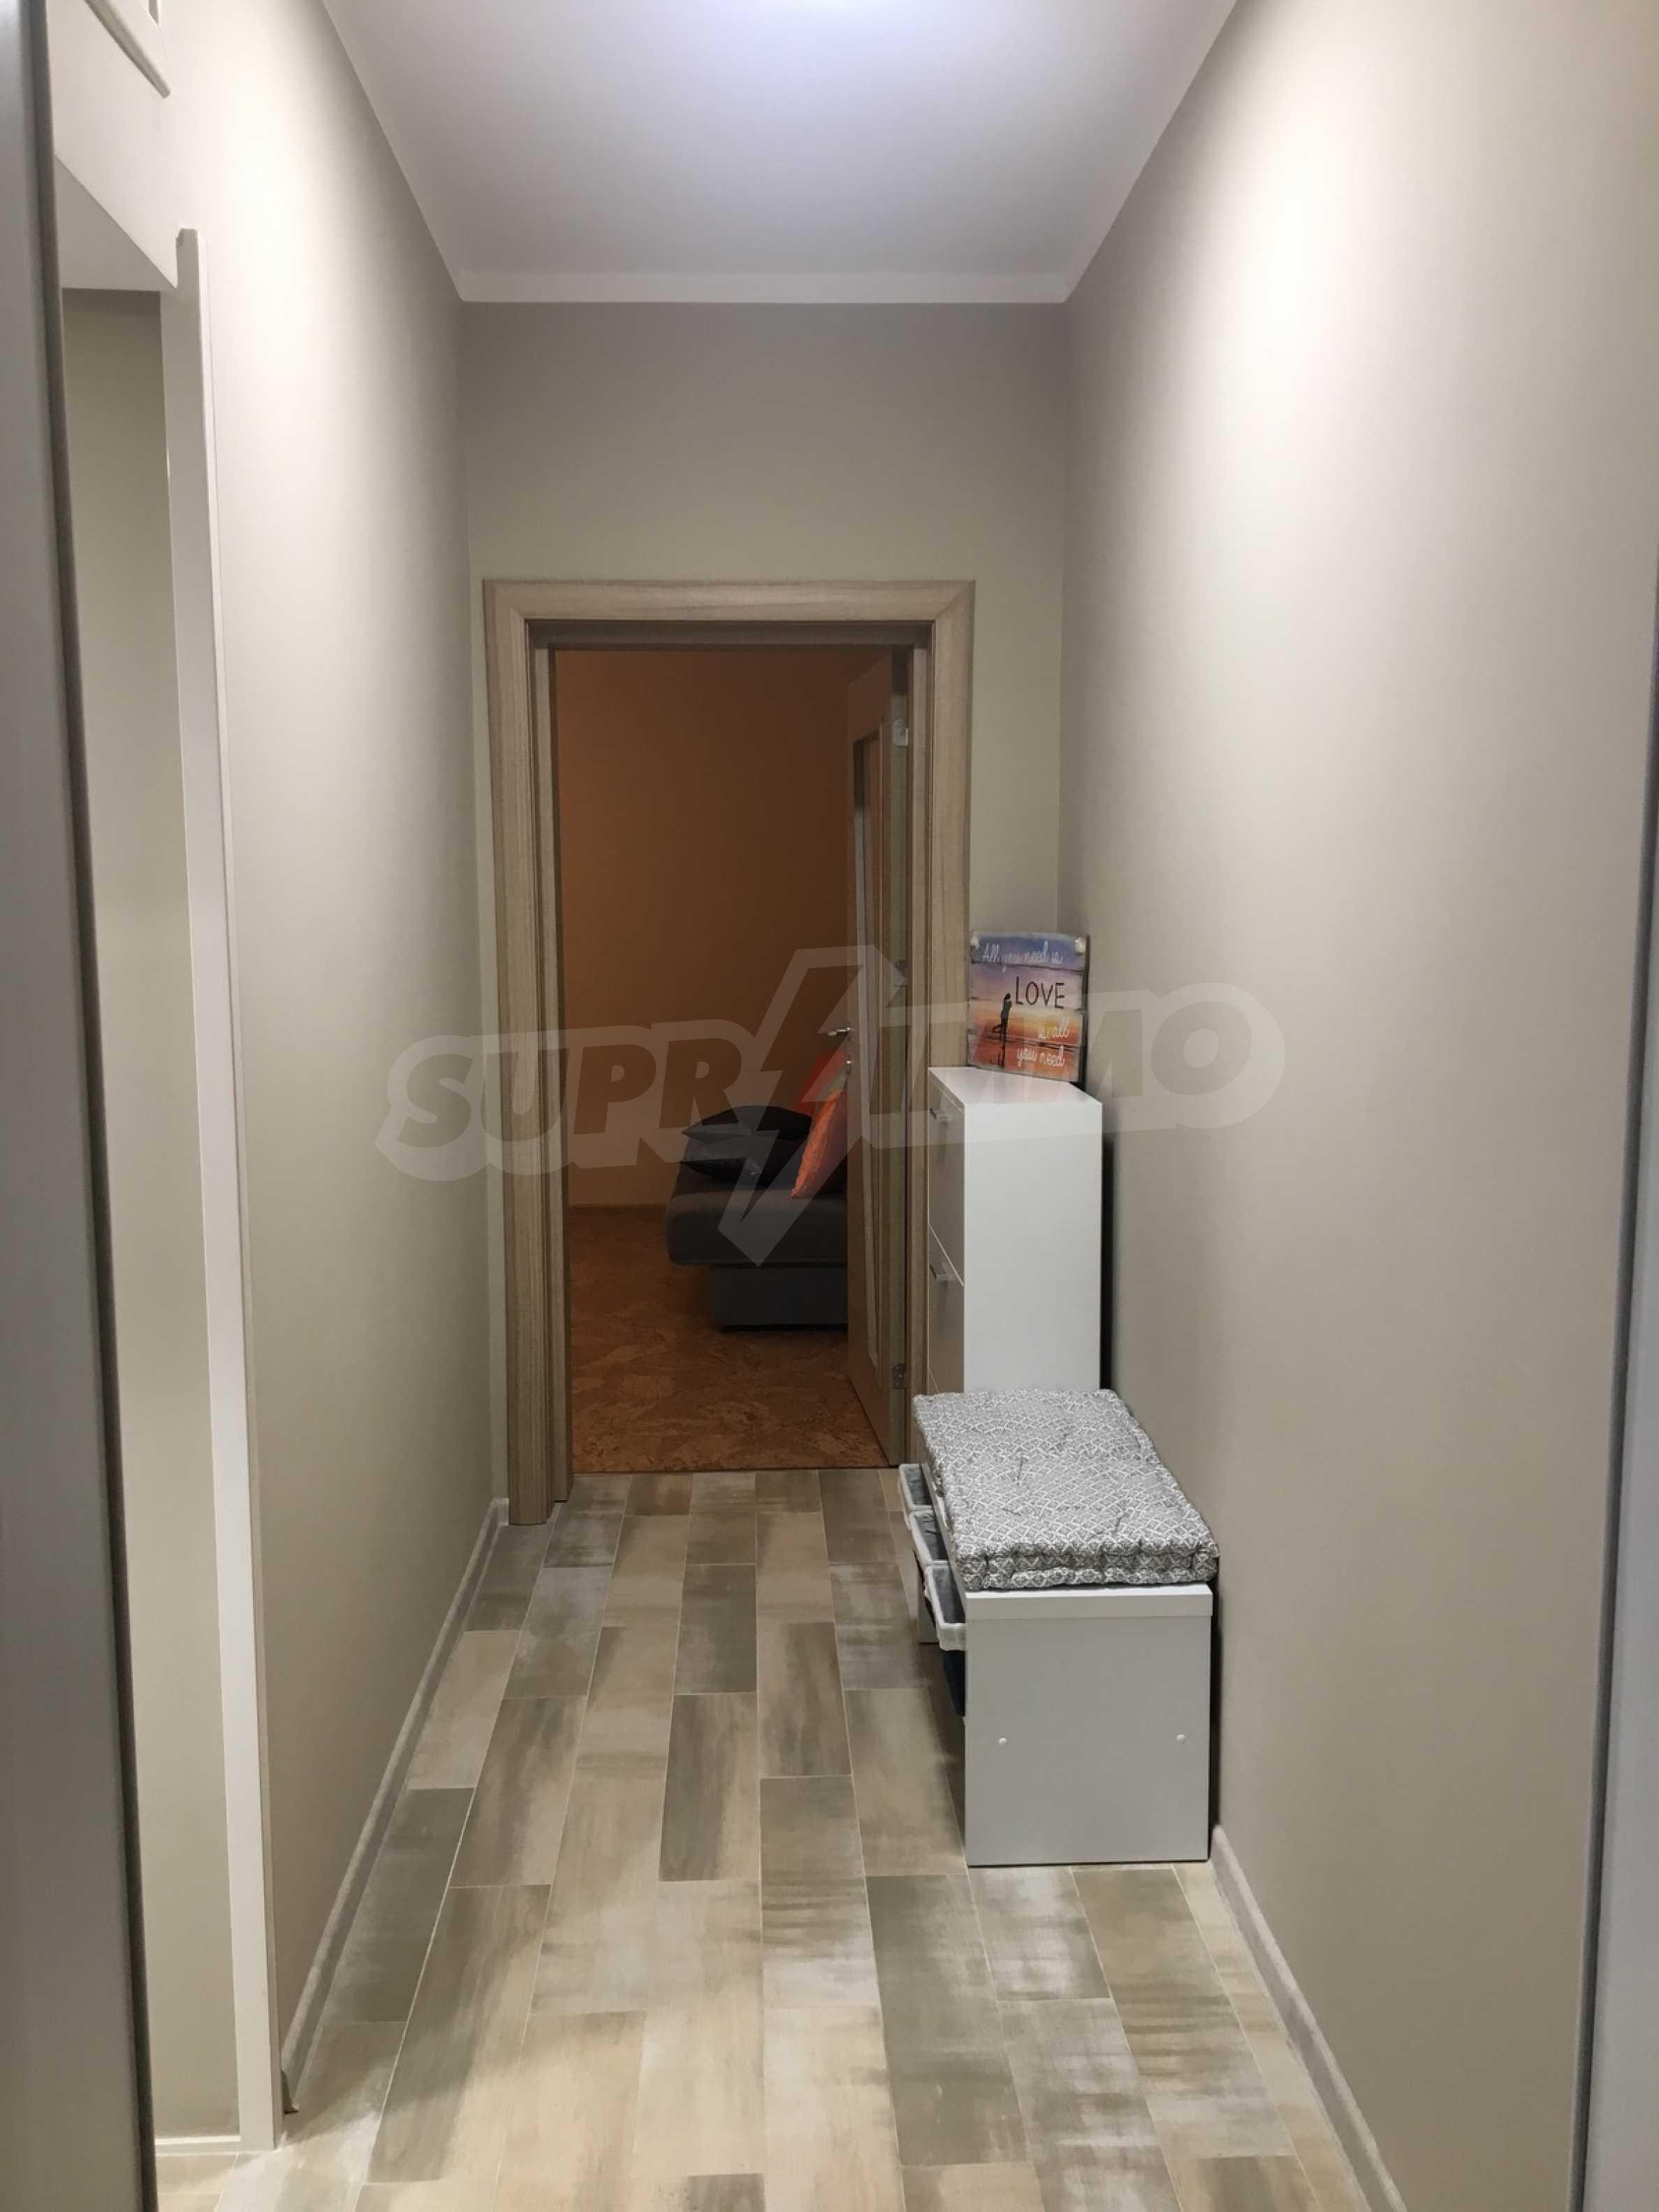 Двустаен апартамент в широк център, гр. Пловдив 6